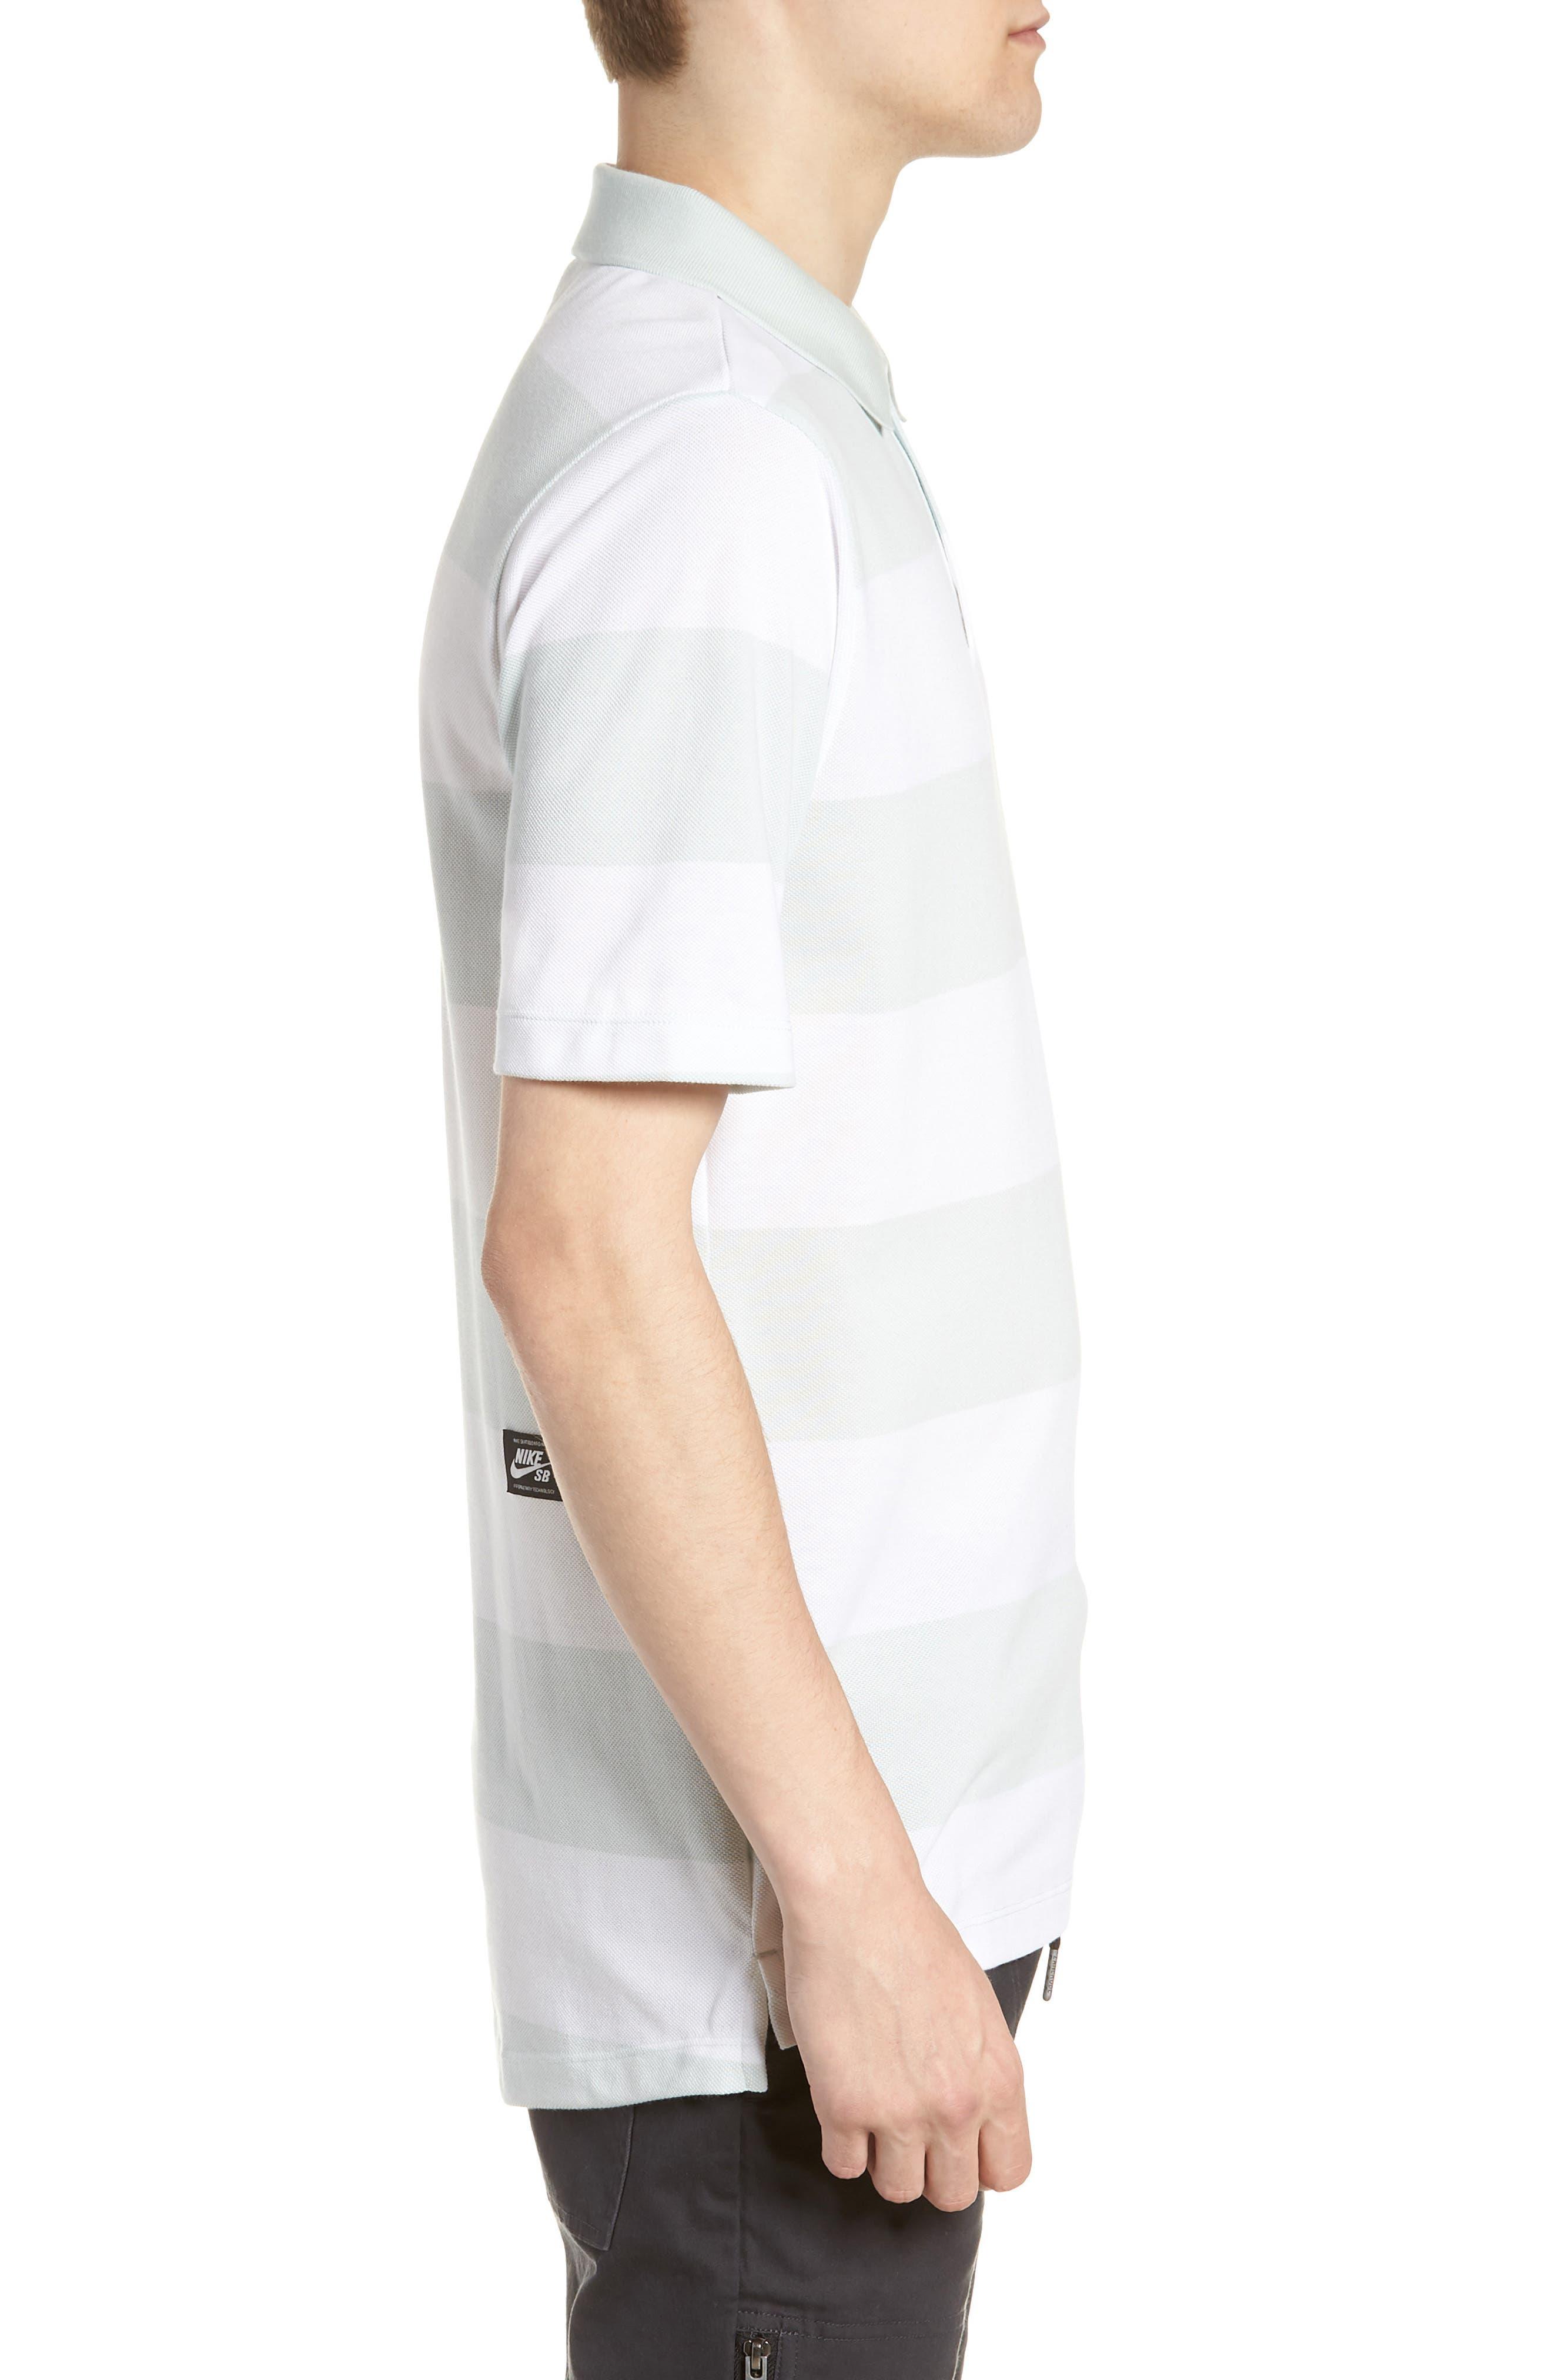 SB Dry Stripe Polo Shirt,                             Alternate thumbnail 3, color,                             BARELY GREY/ BARELY GREY